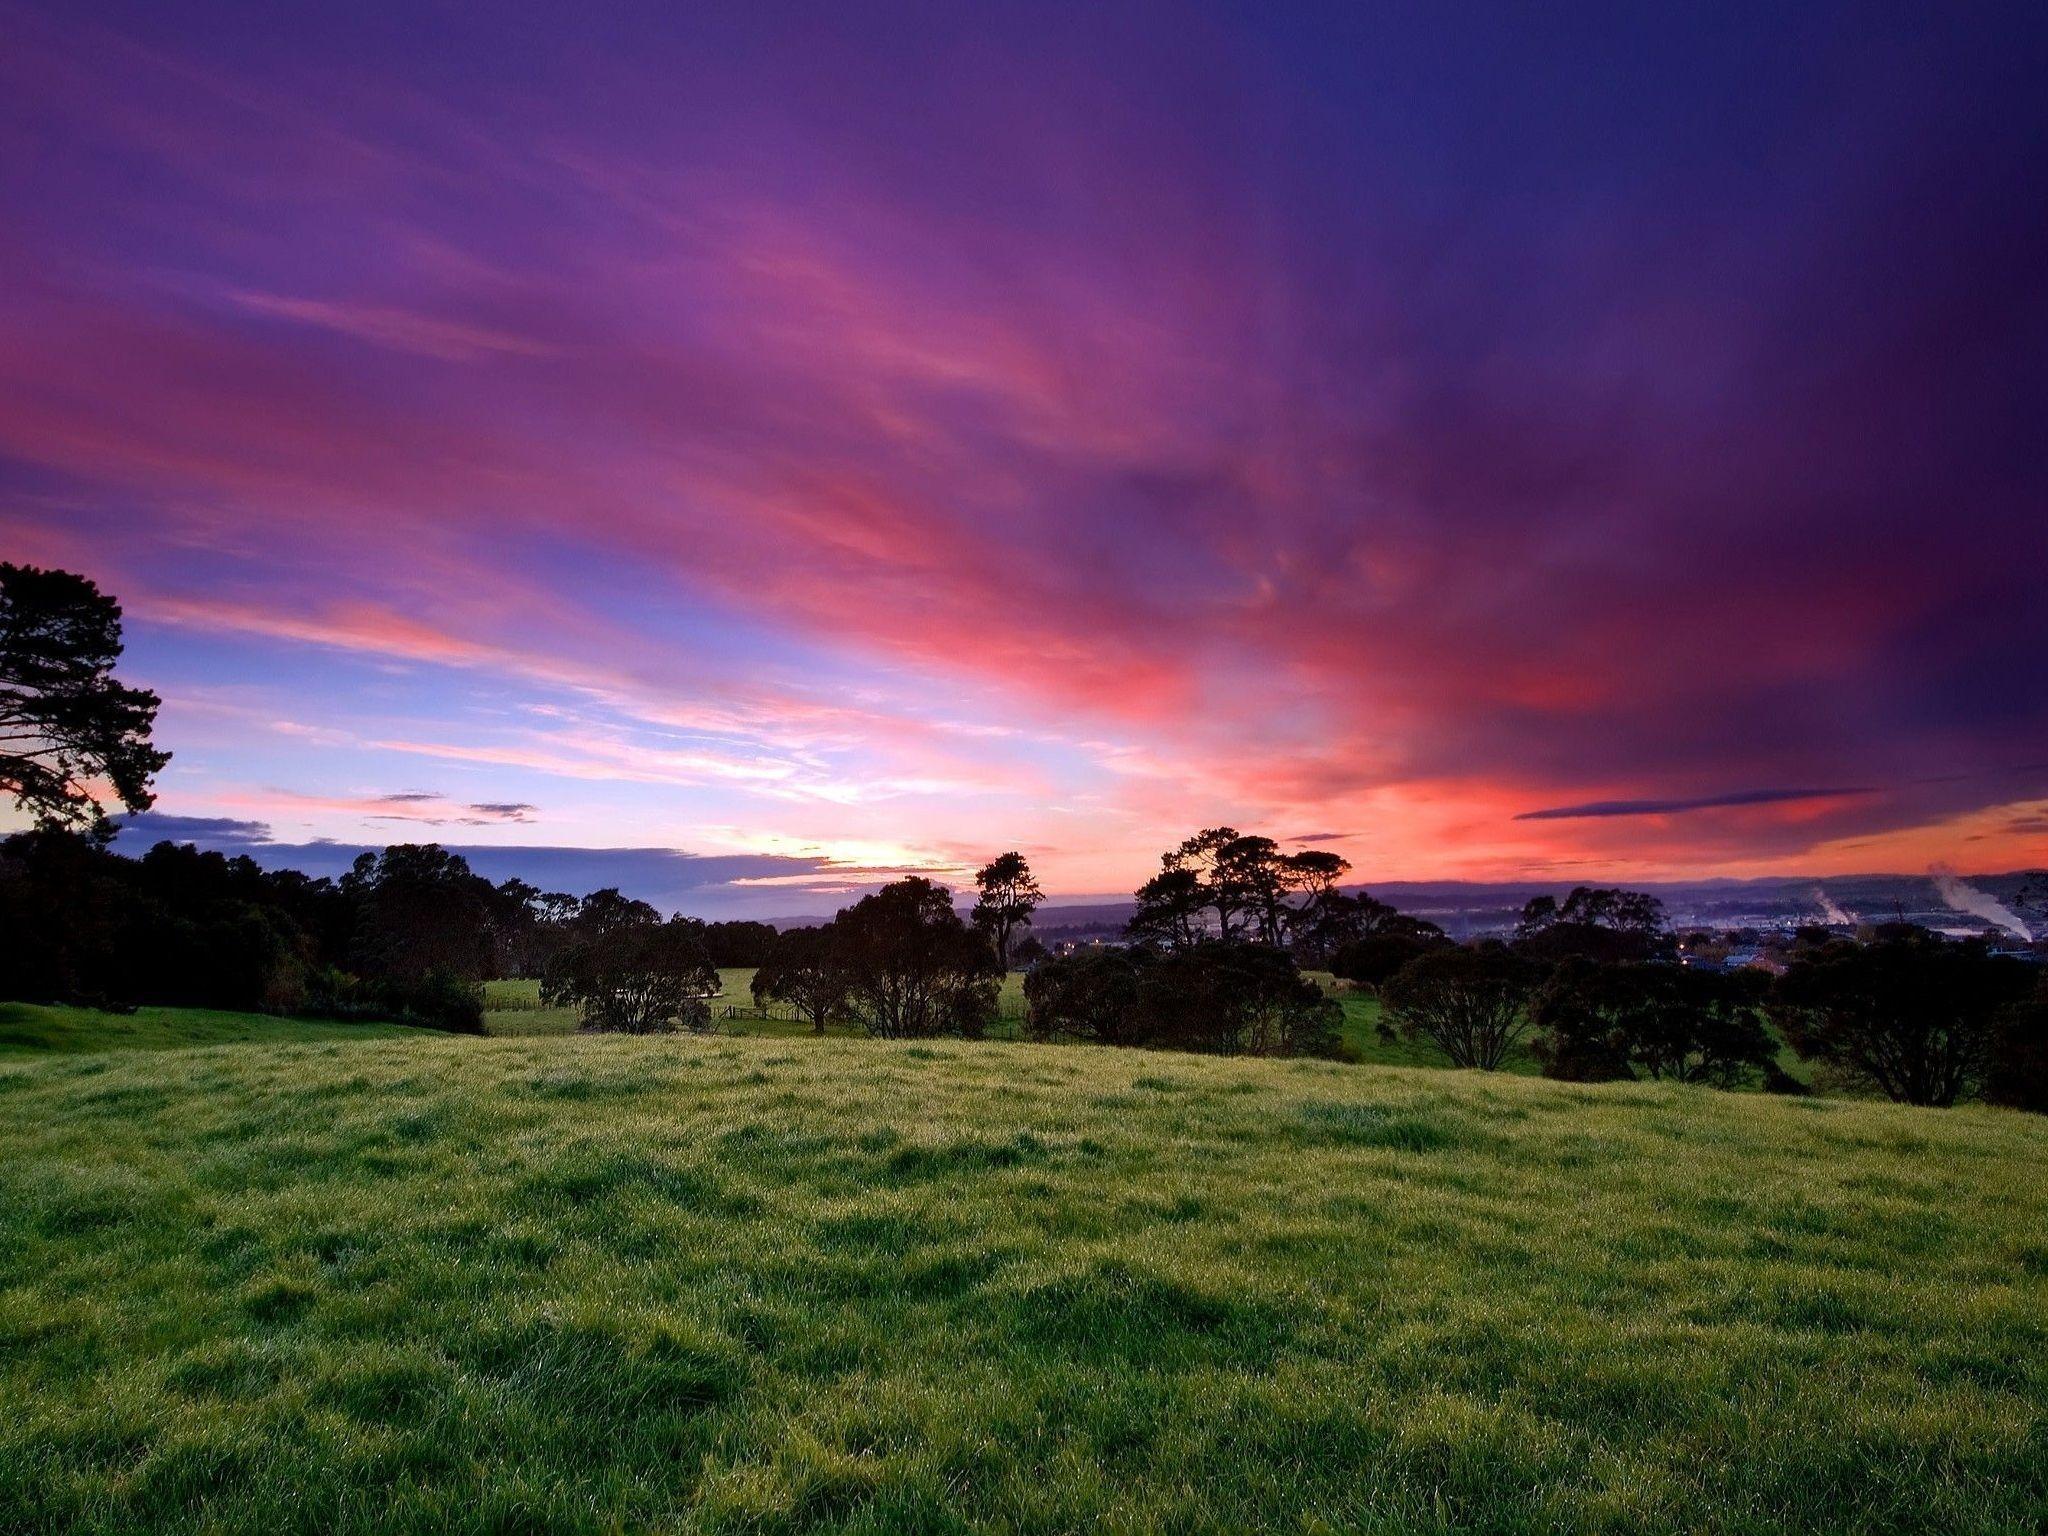 Sky: OH BEAUTIFUL MORNING Color Beautful Sky Gorgeous Vivid Vibrant ...